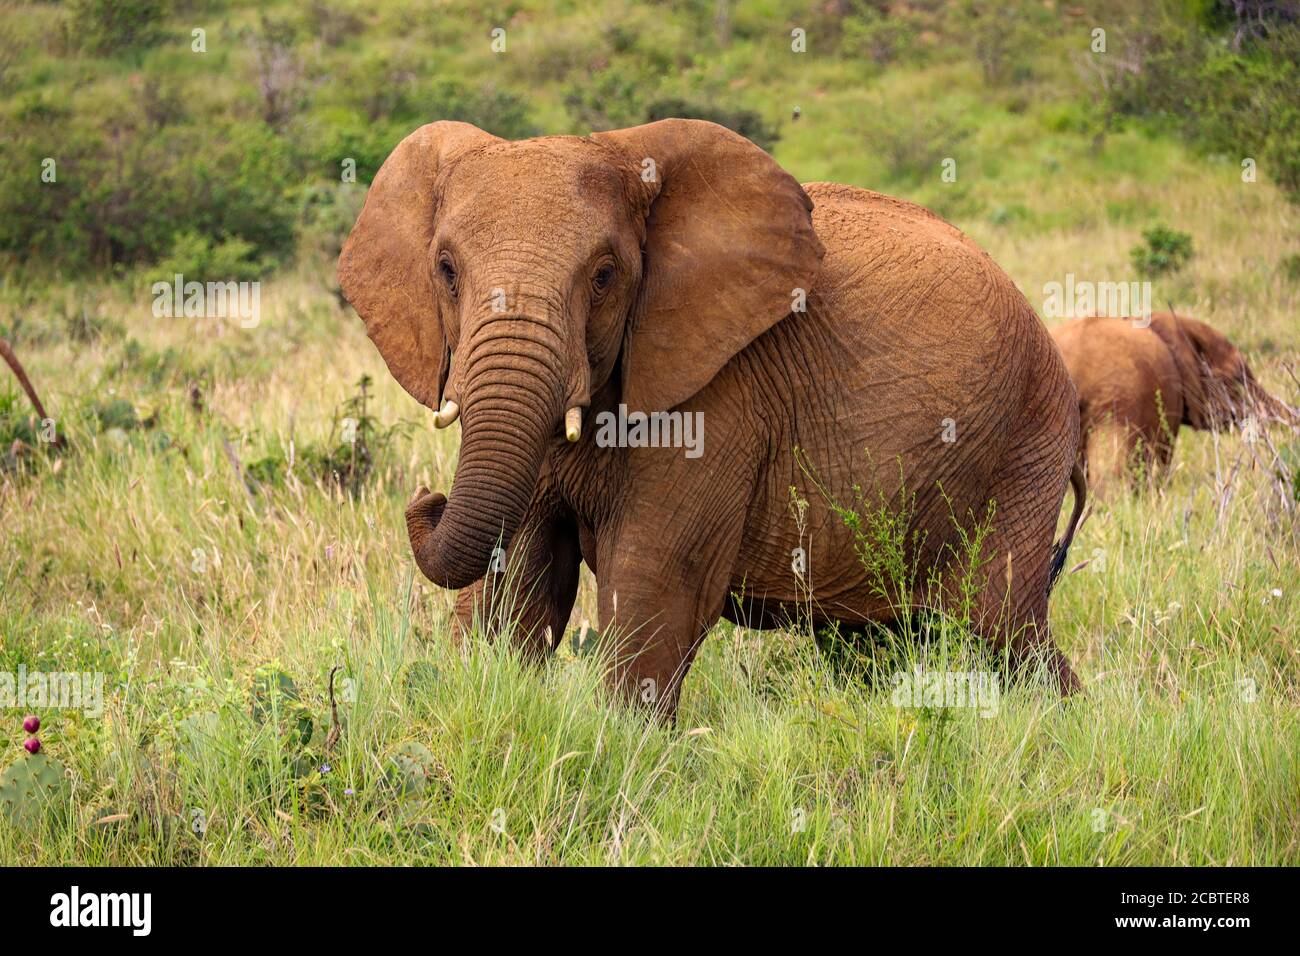 Close up of isolated large bull elephant grazing in Kenya, Africa Stock Photo